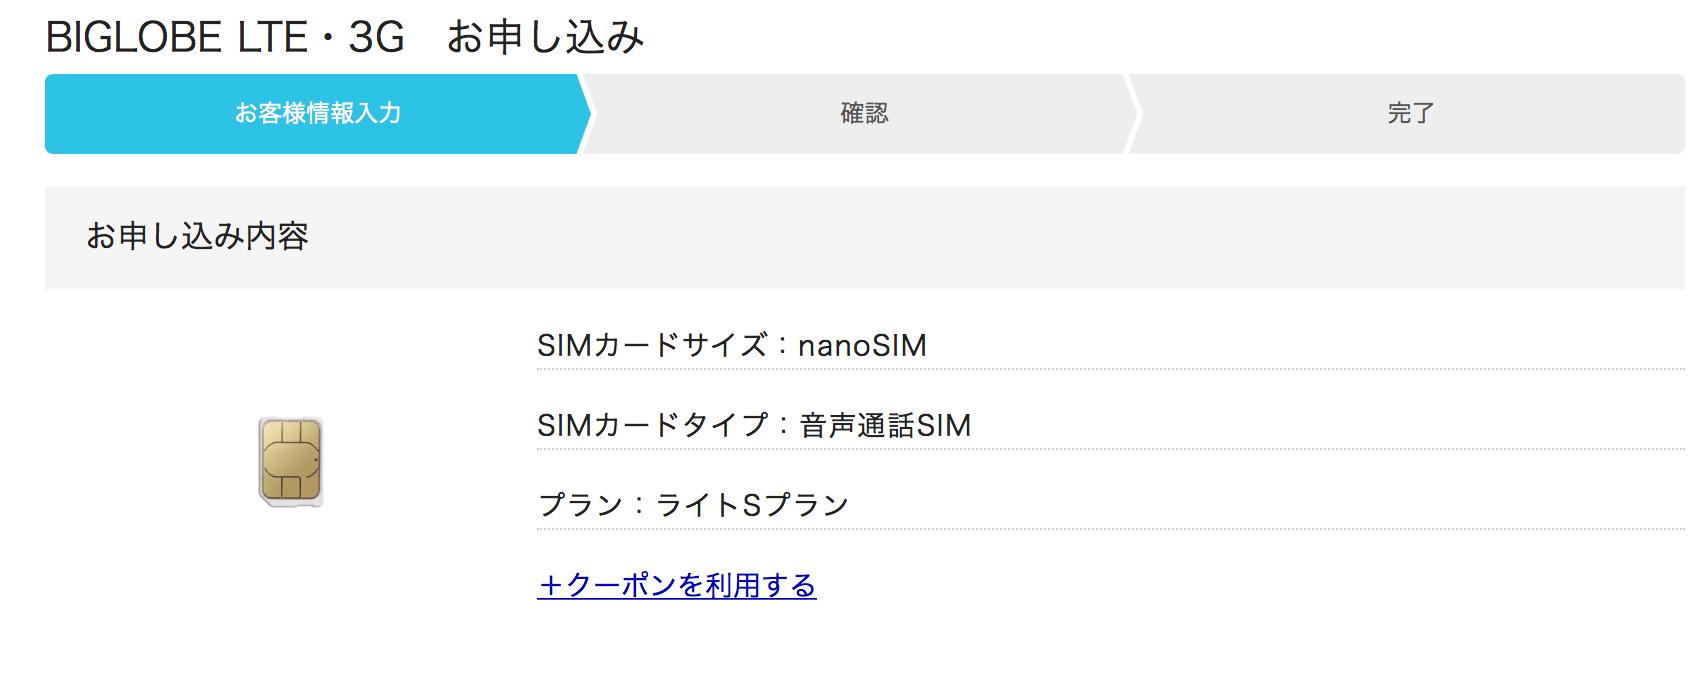 BIGLOBE SIM iPhone7購入者の登録手順